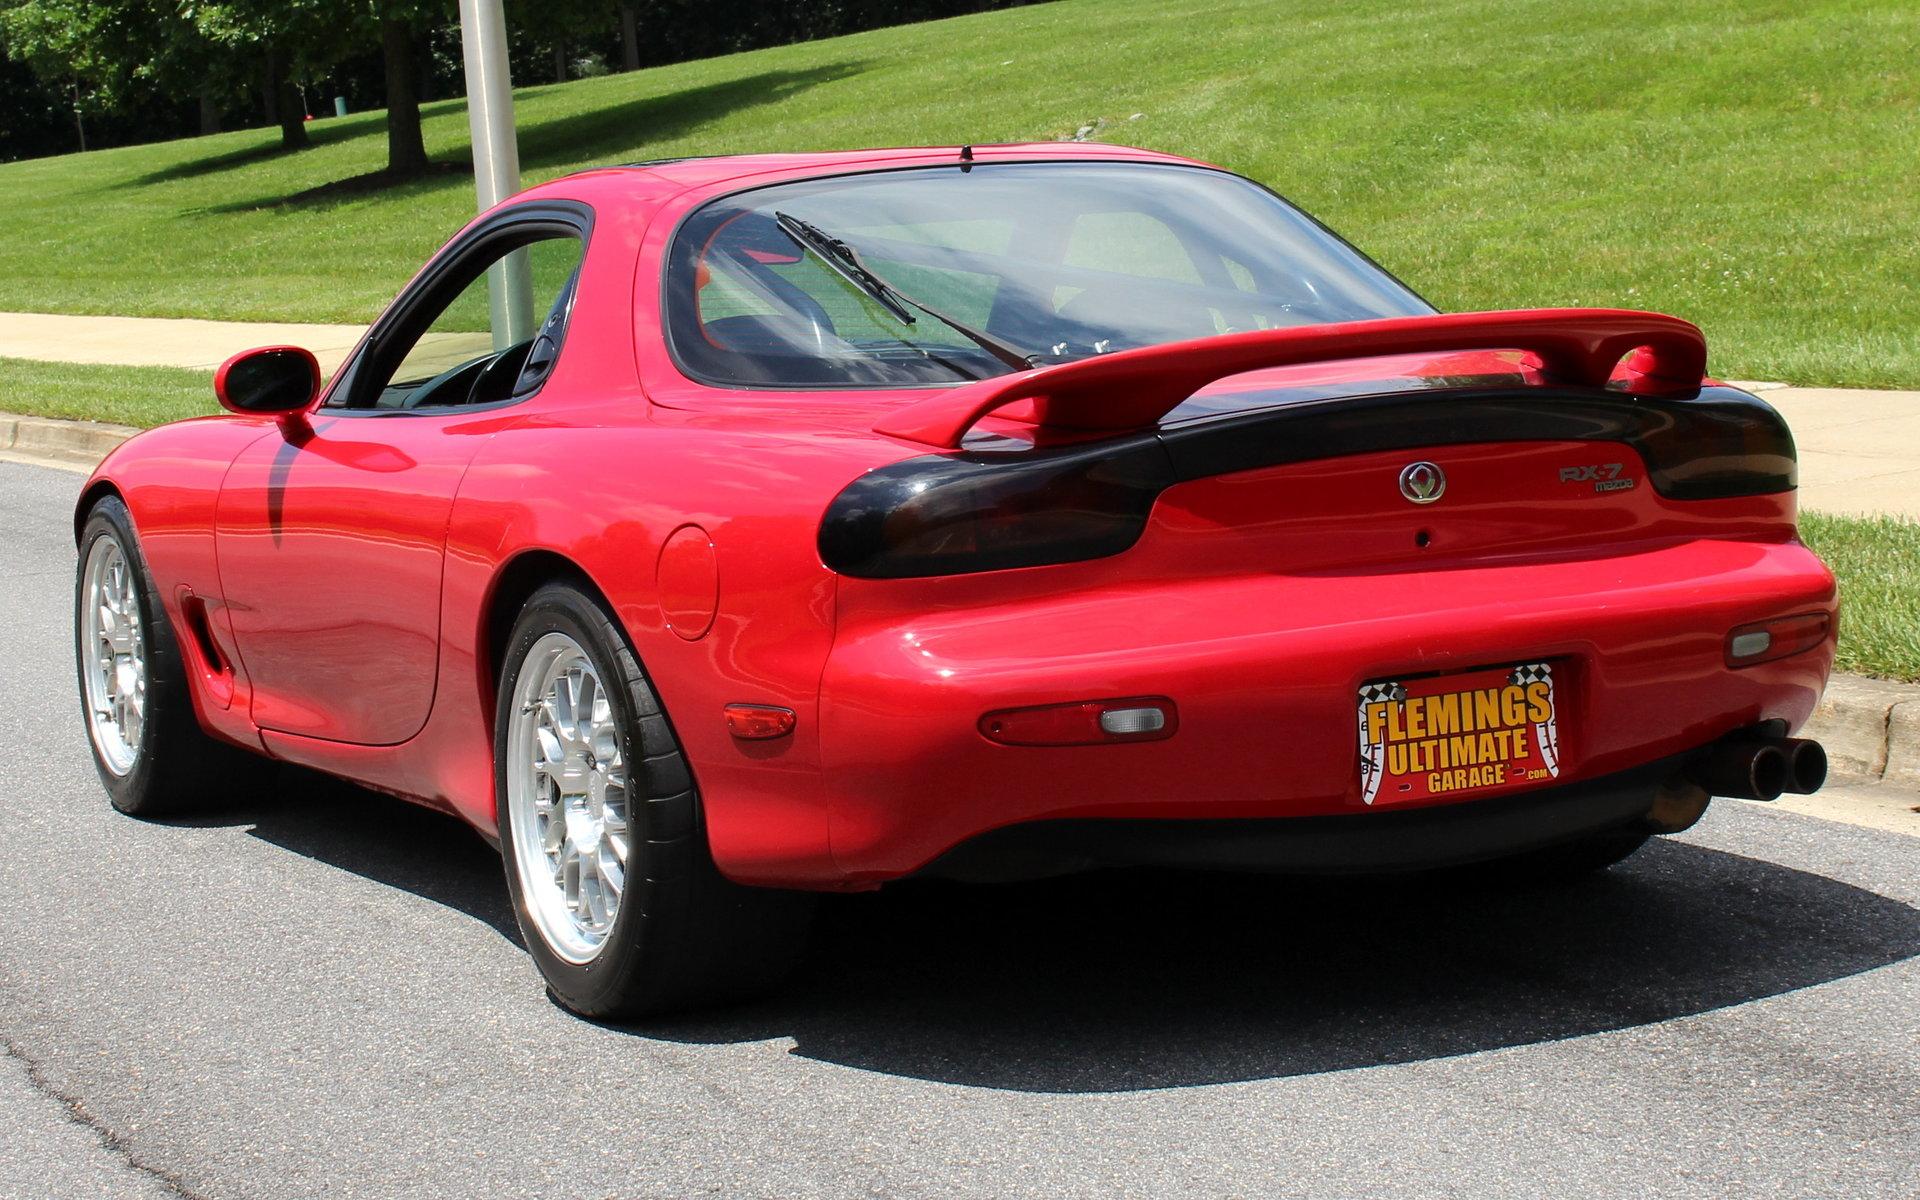 Mazda Dealership Md >> 1994 Mazda RX-7 Twin Turbo for sale #76230 | MCG